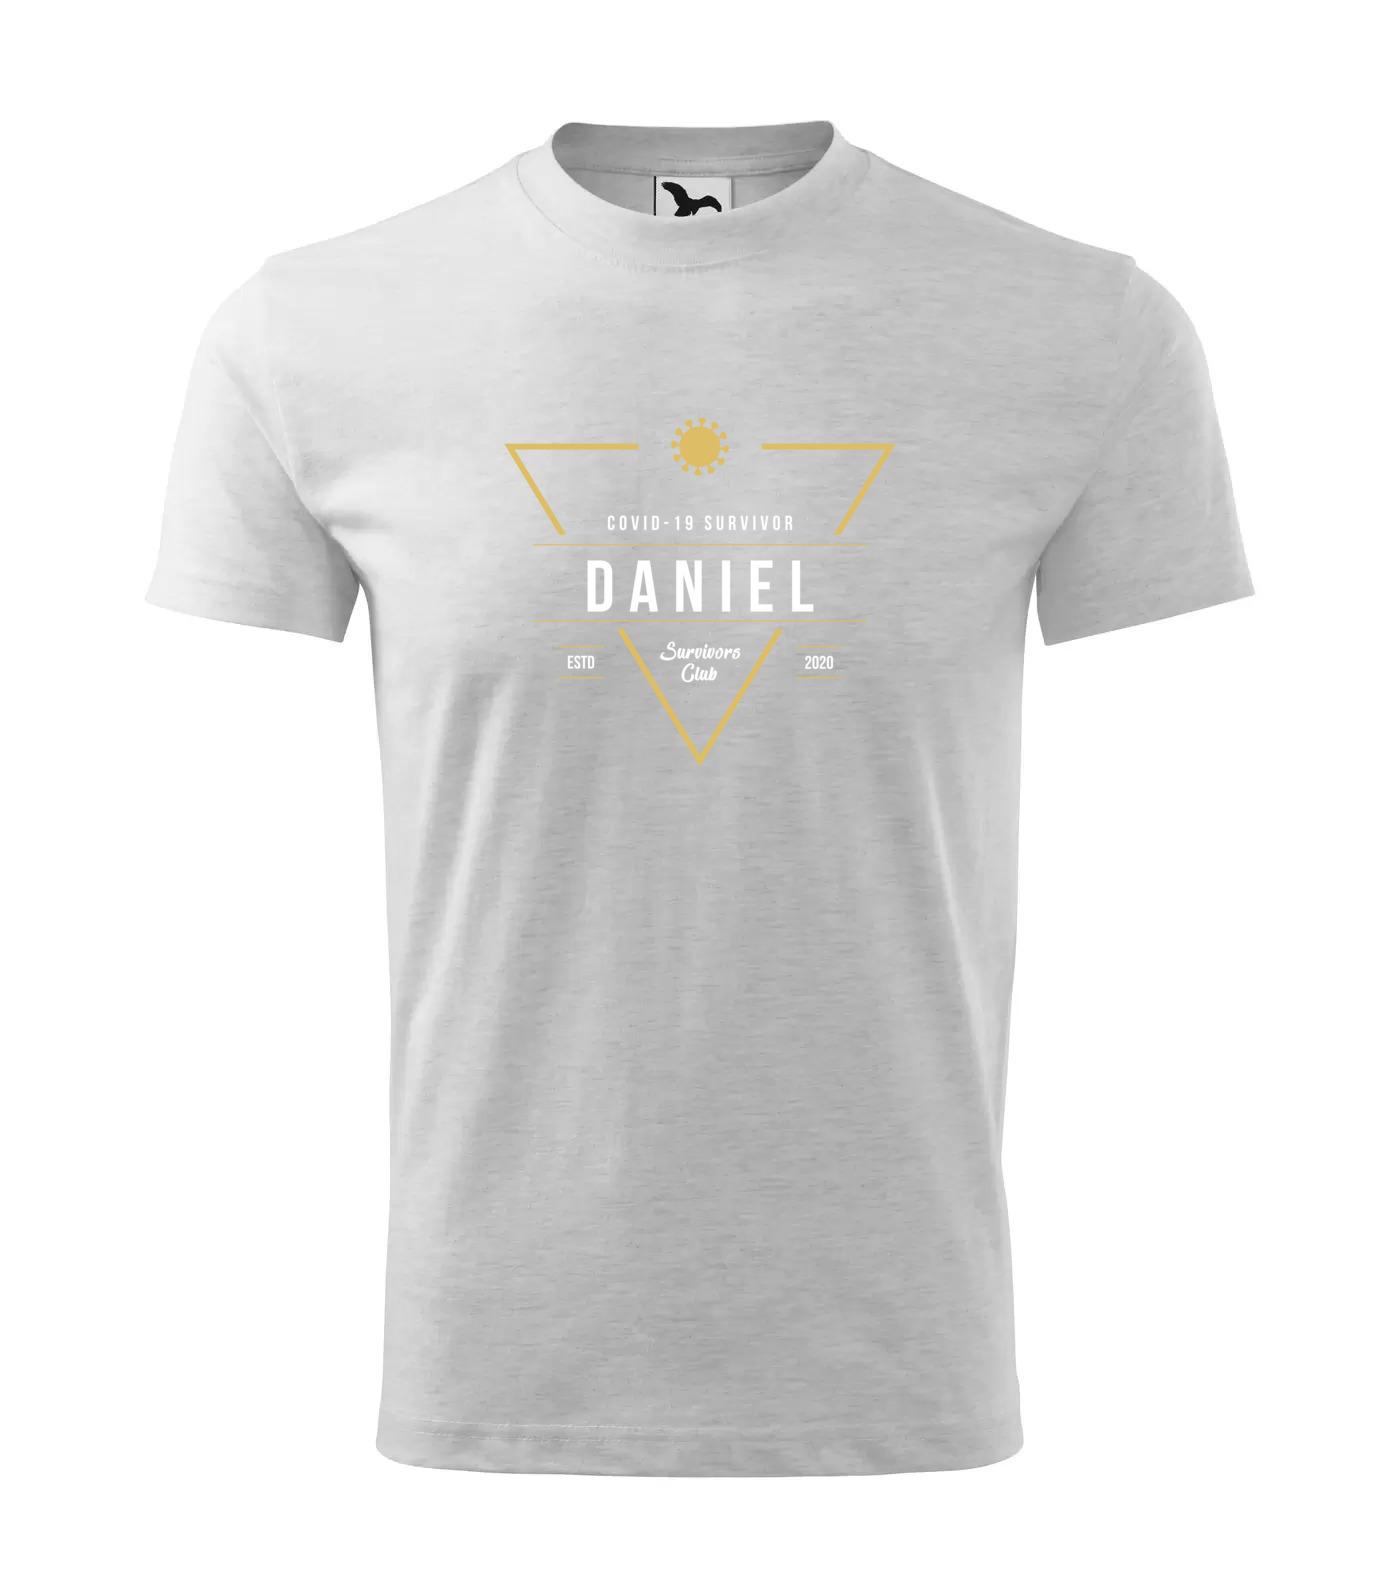 Tričko Survivor Club Daniel